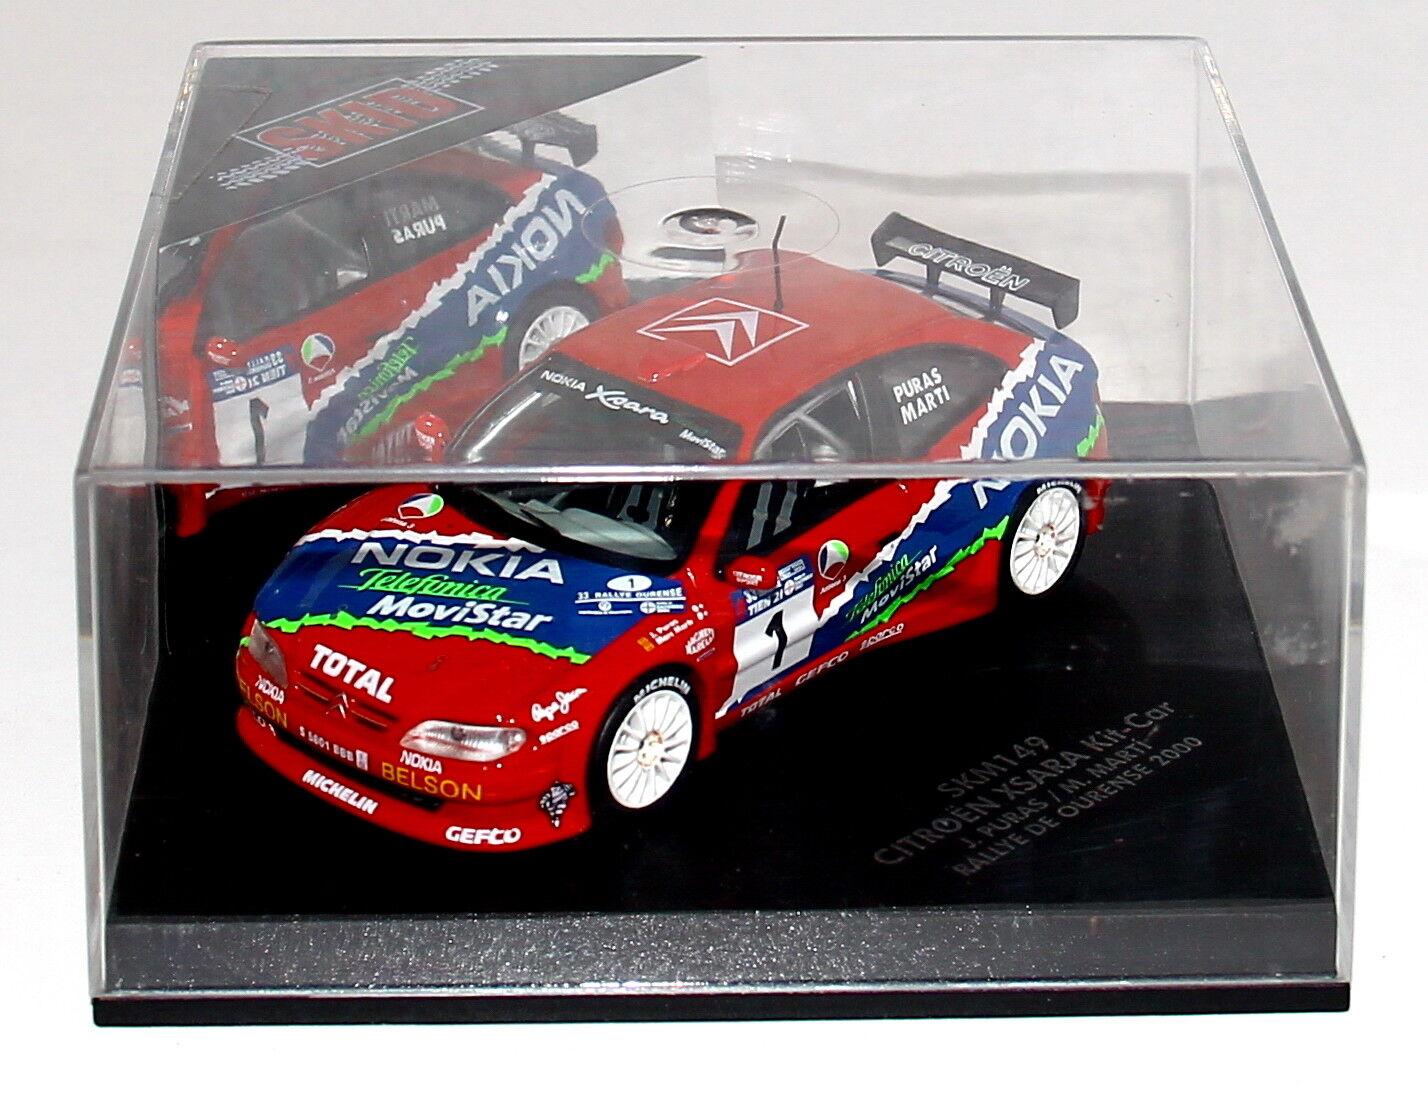 Skid SKM149 1 43 Citroen Xsara Kit Car Rally de Orense 2000 Puras RARE